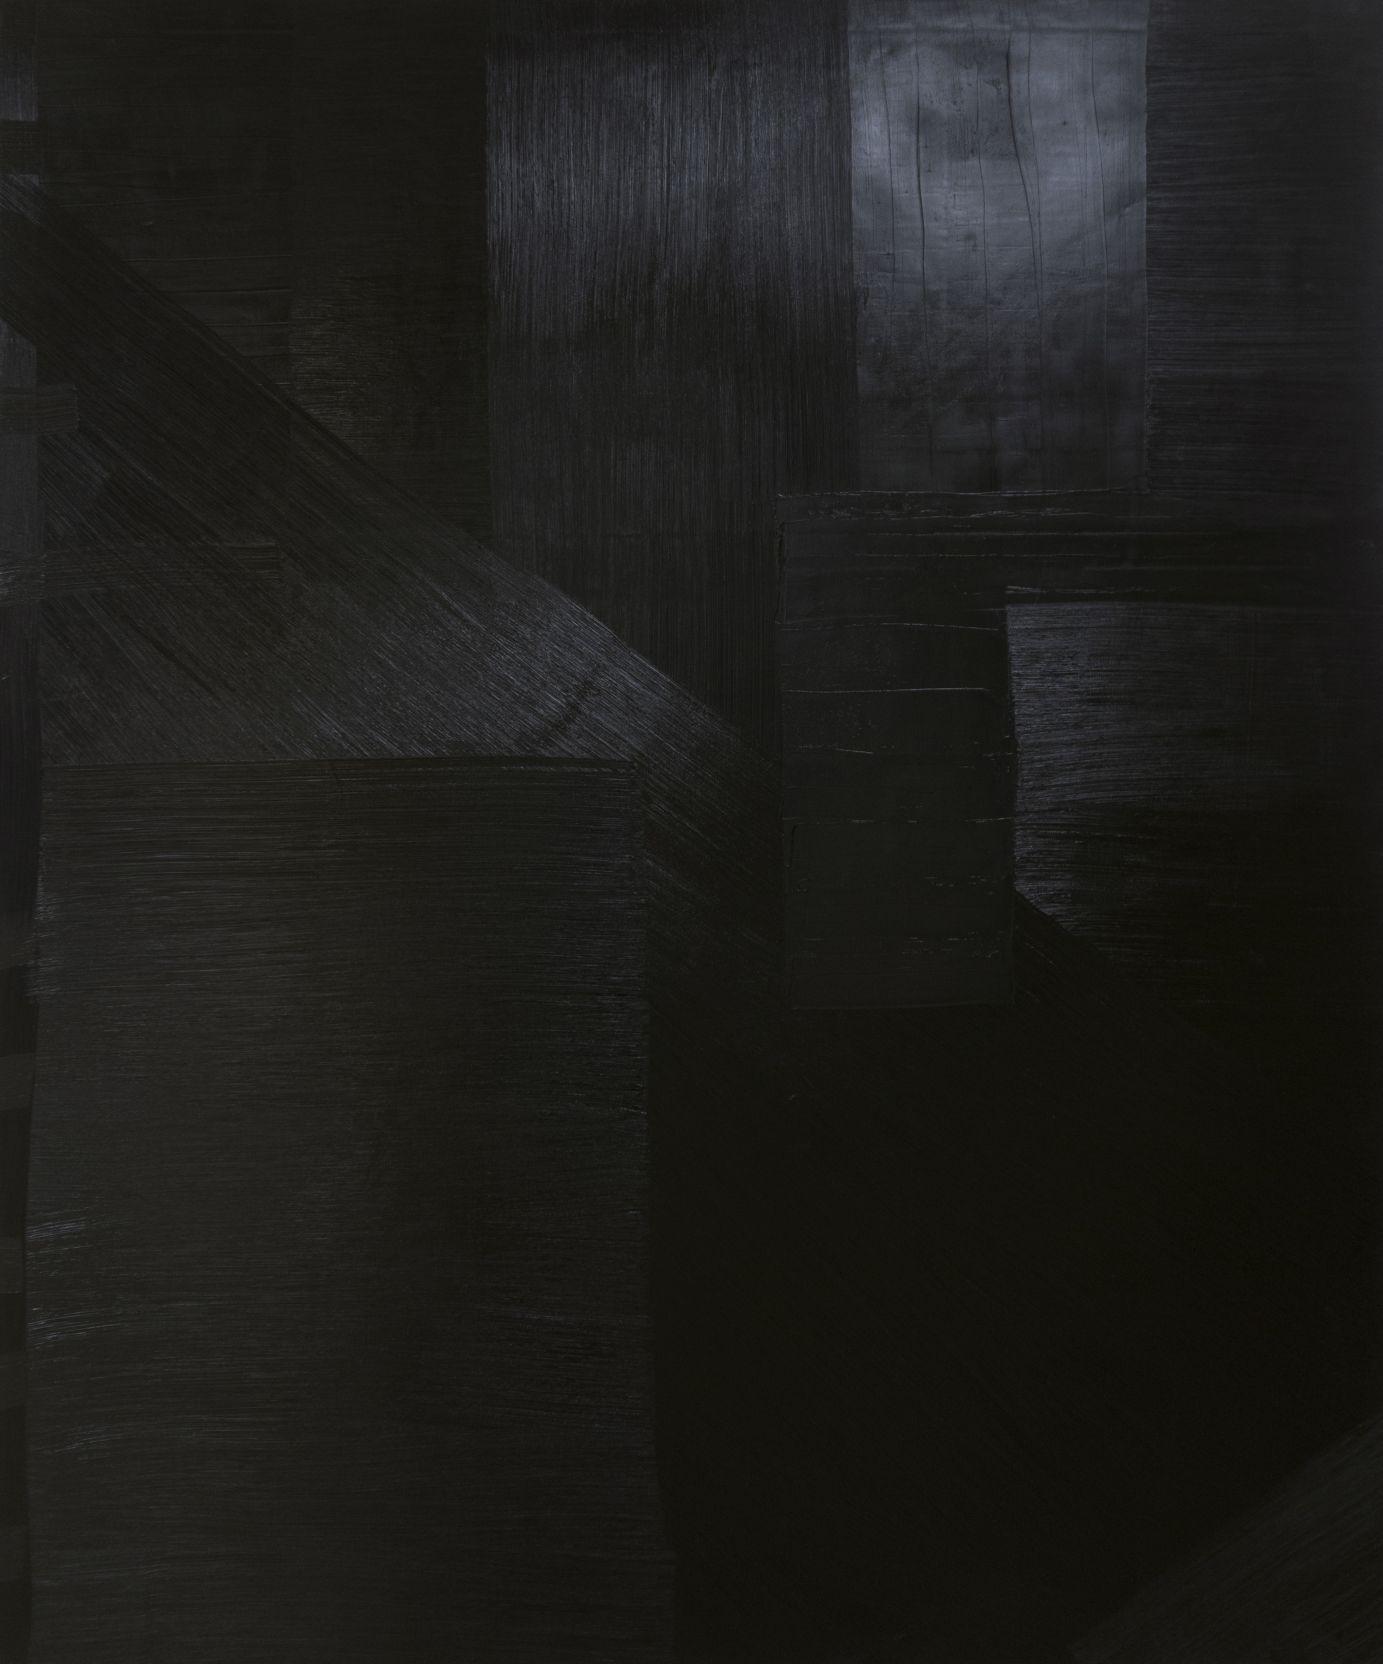 Beltza (2018) - Javier Casanueva